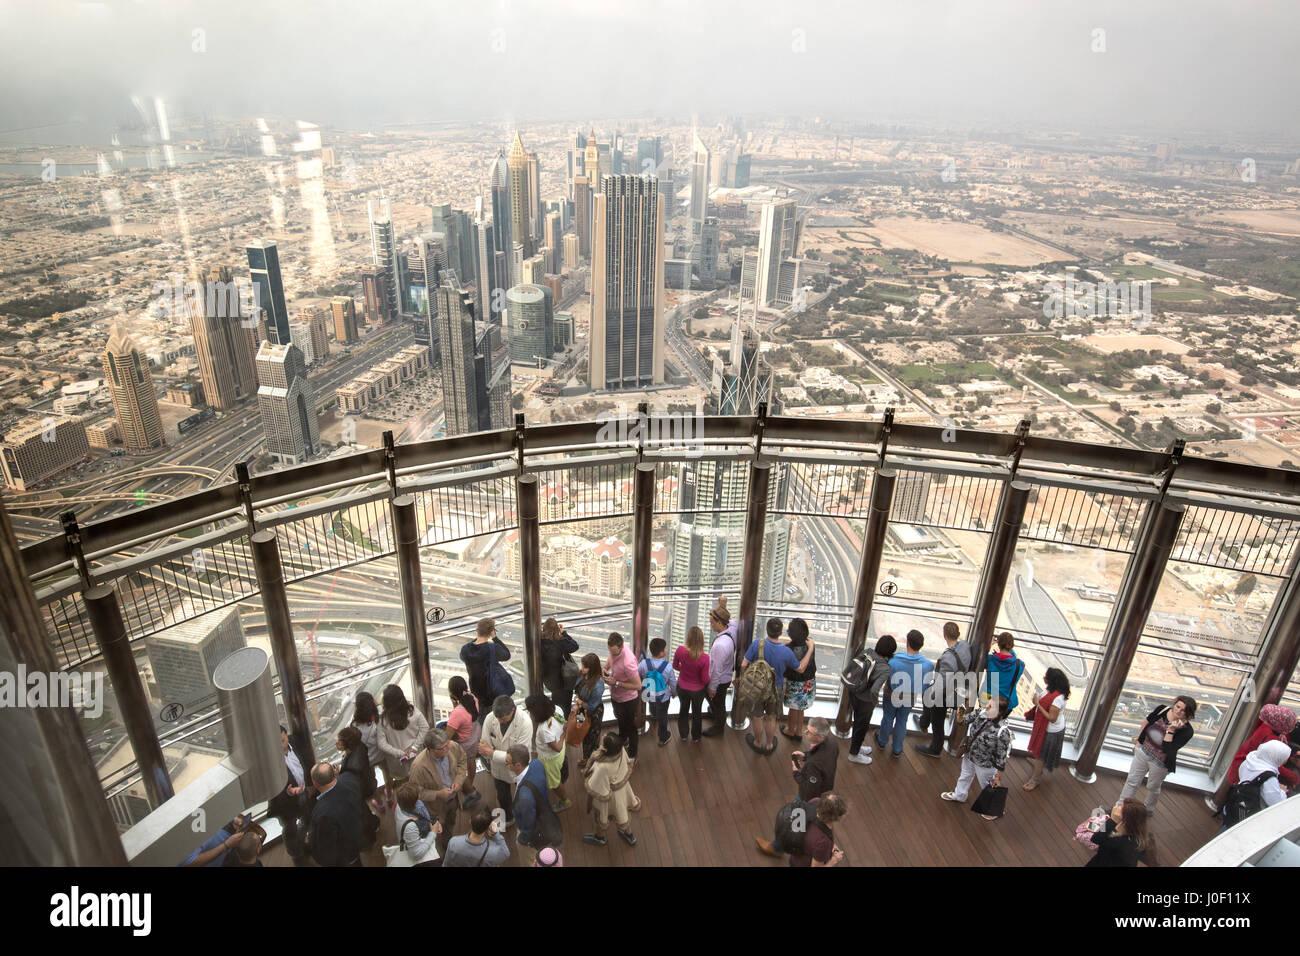 Burj Khalifa Interior Stock Photos & Burj Khalifa Interior